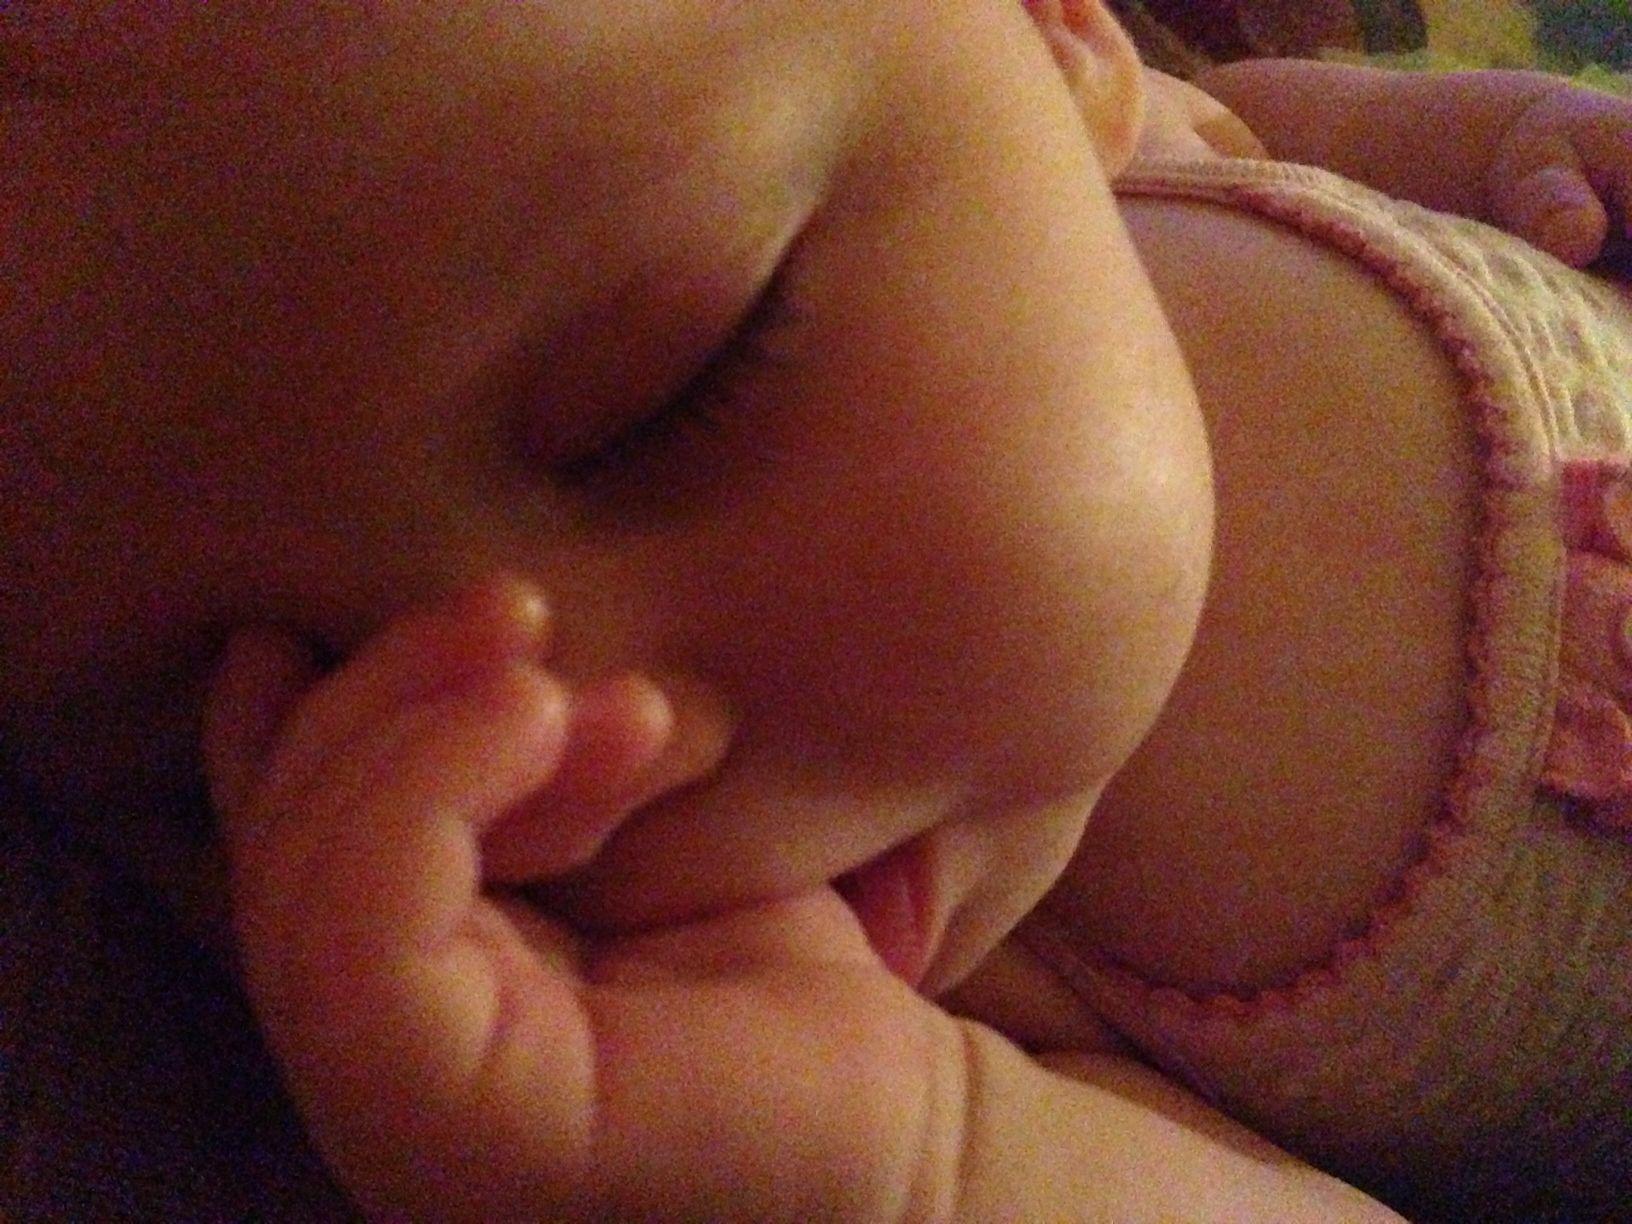 Baby sucking its thumb